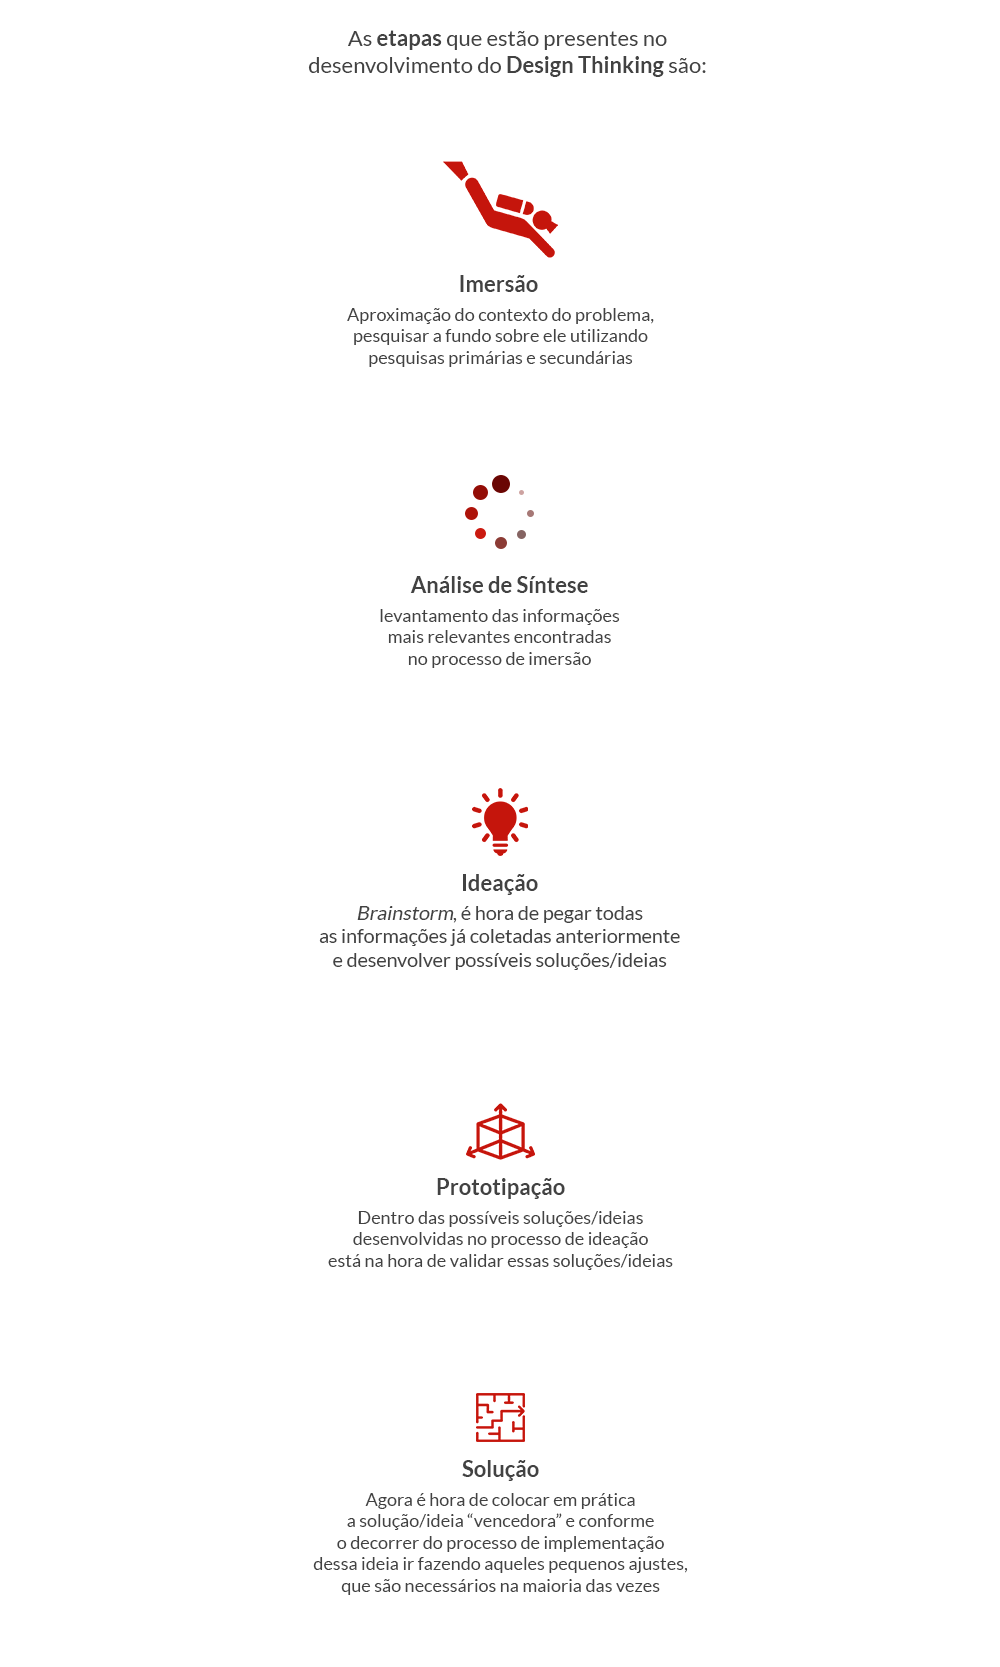 etapas-design thinking - designculture.com.br